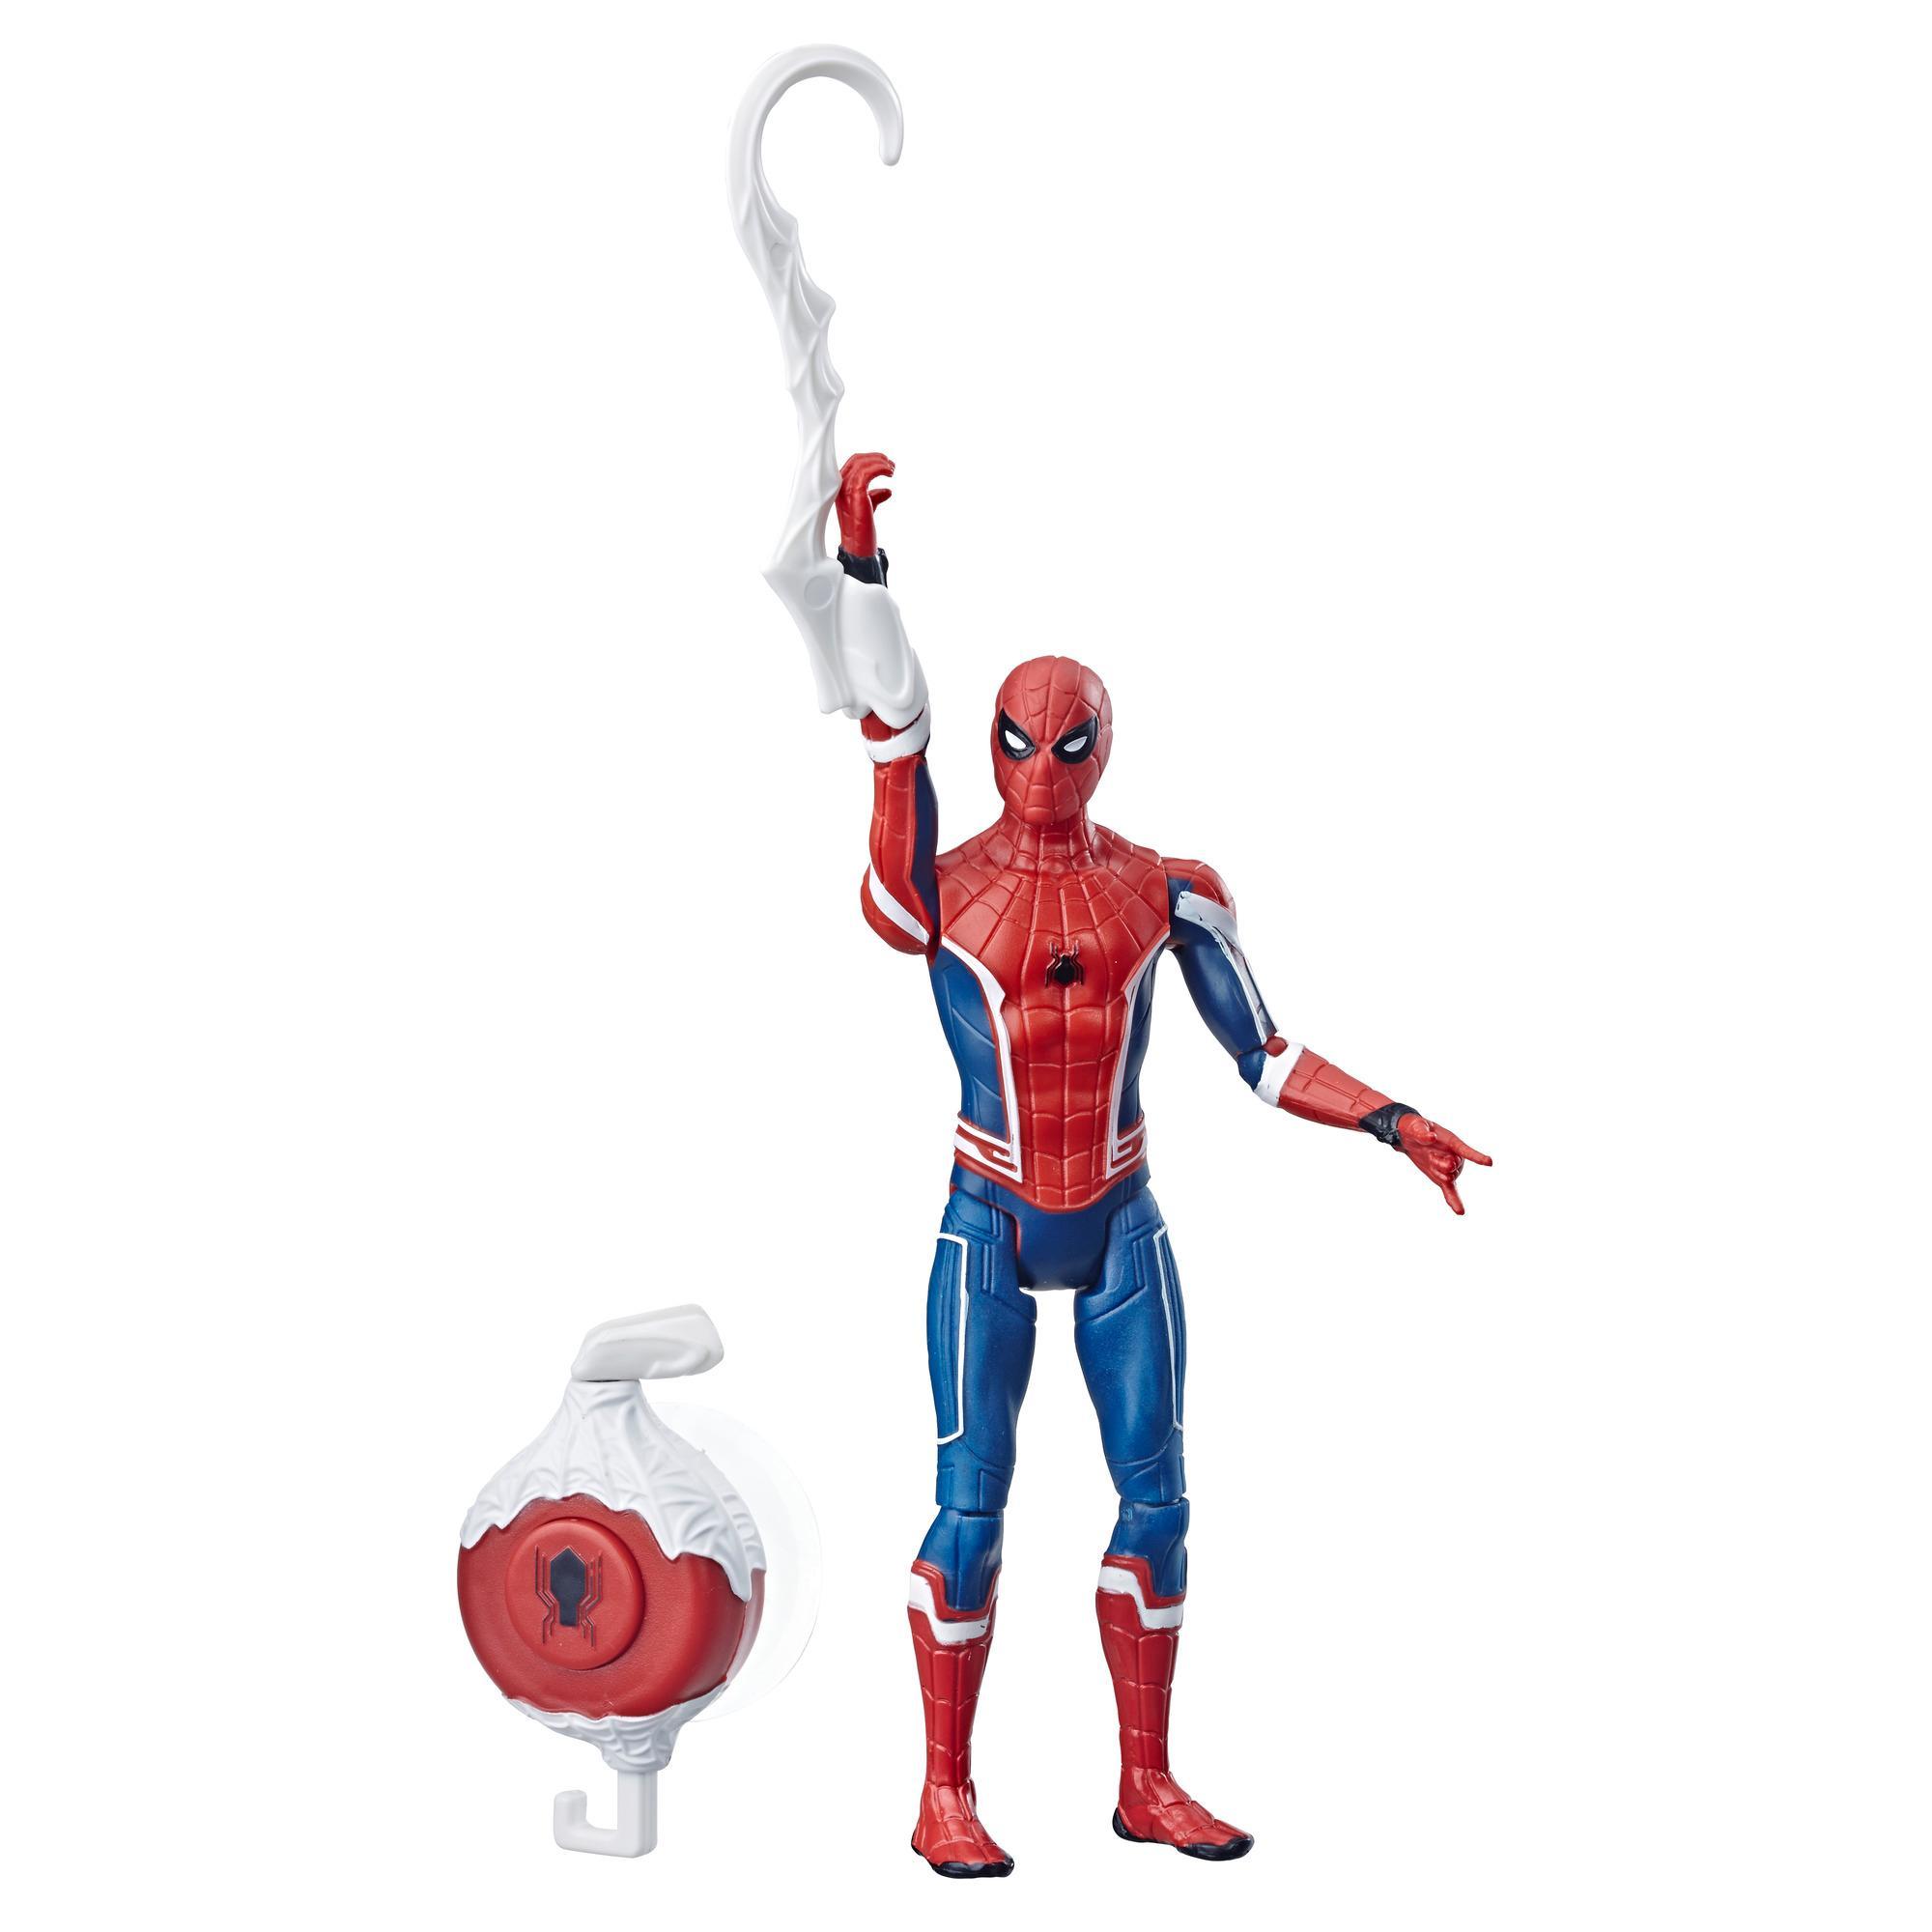 Фигурка Человек-паук 15 см делюкс Человек паук Алтимейт Краулер SPIDER-MAN E4116